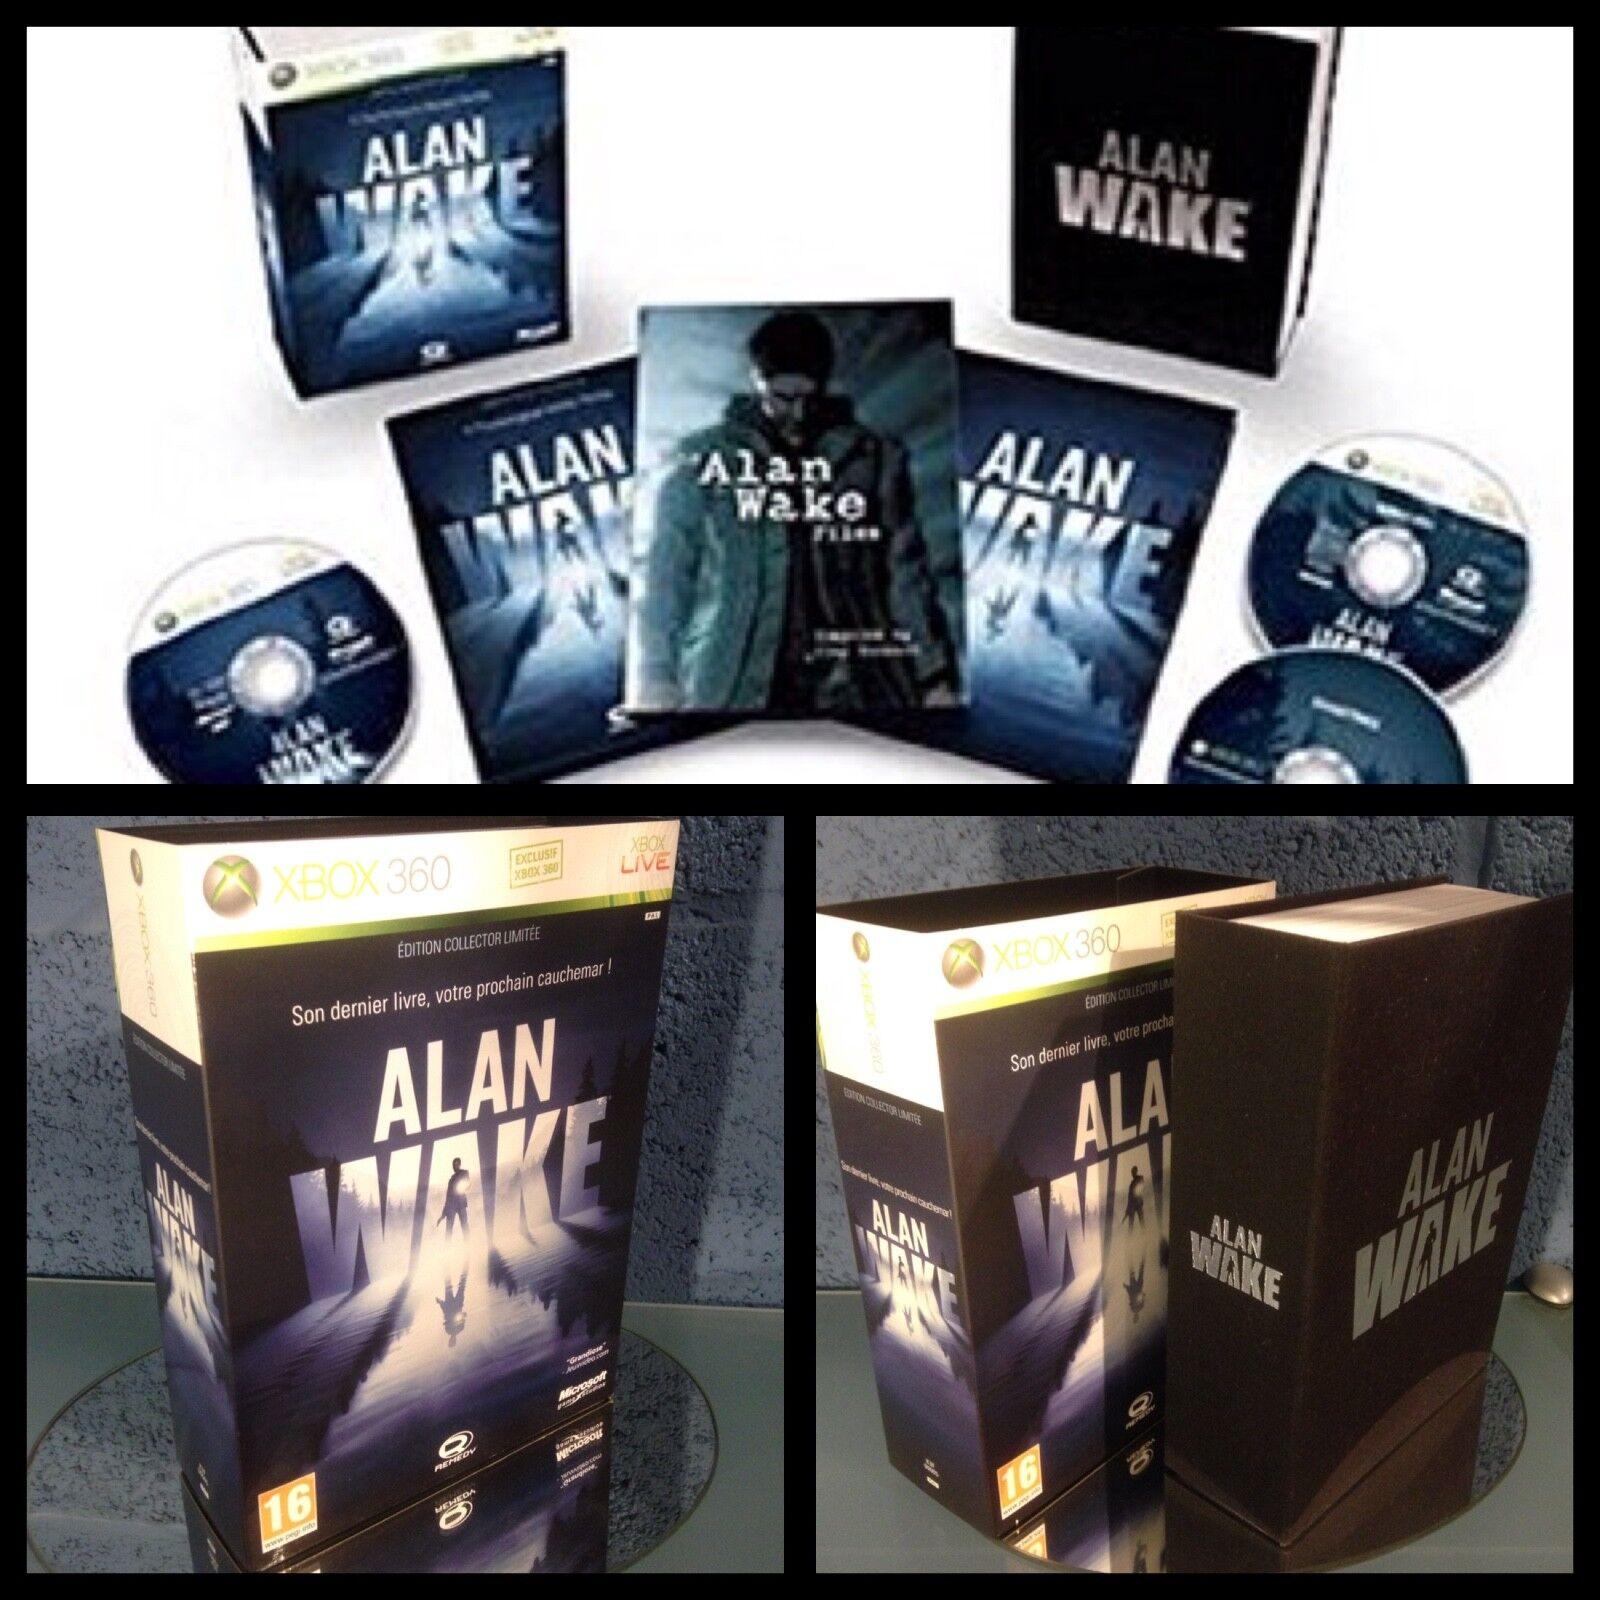 Alan wake.Collector. Edition limitée.Pal.Xbox 360.